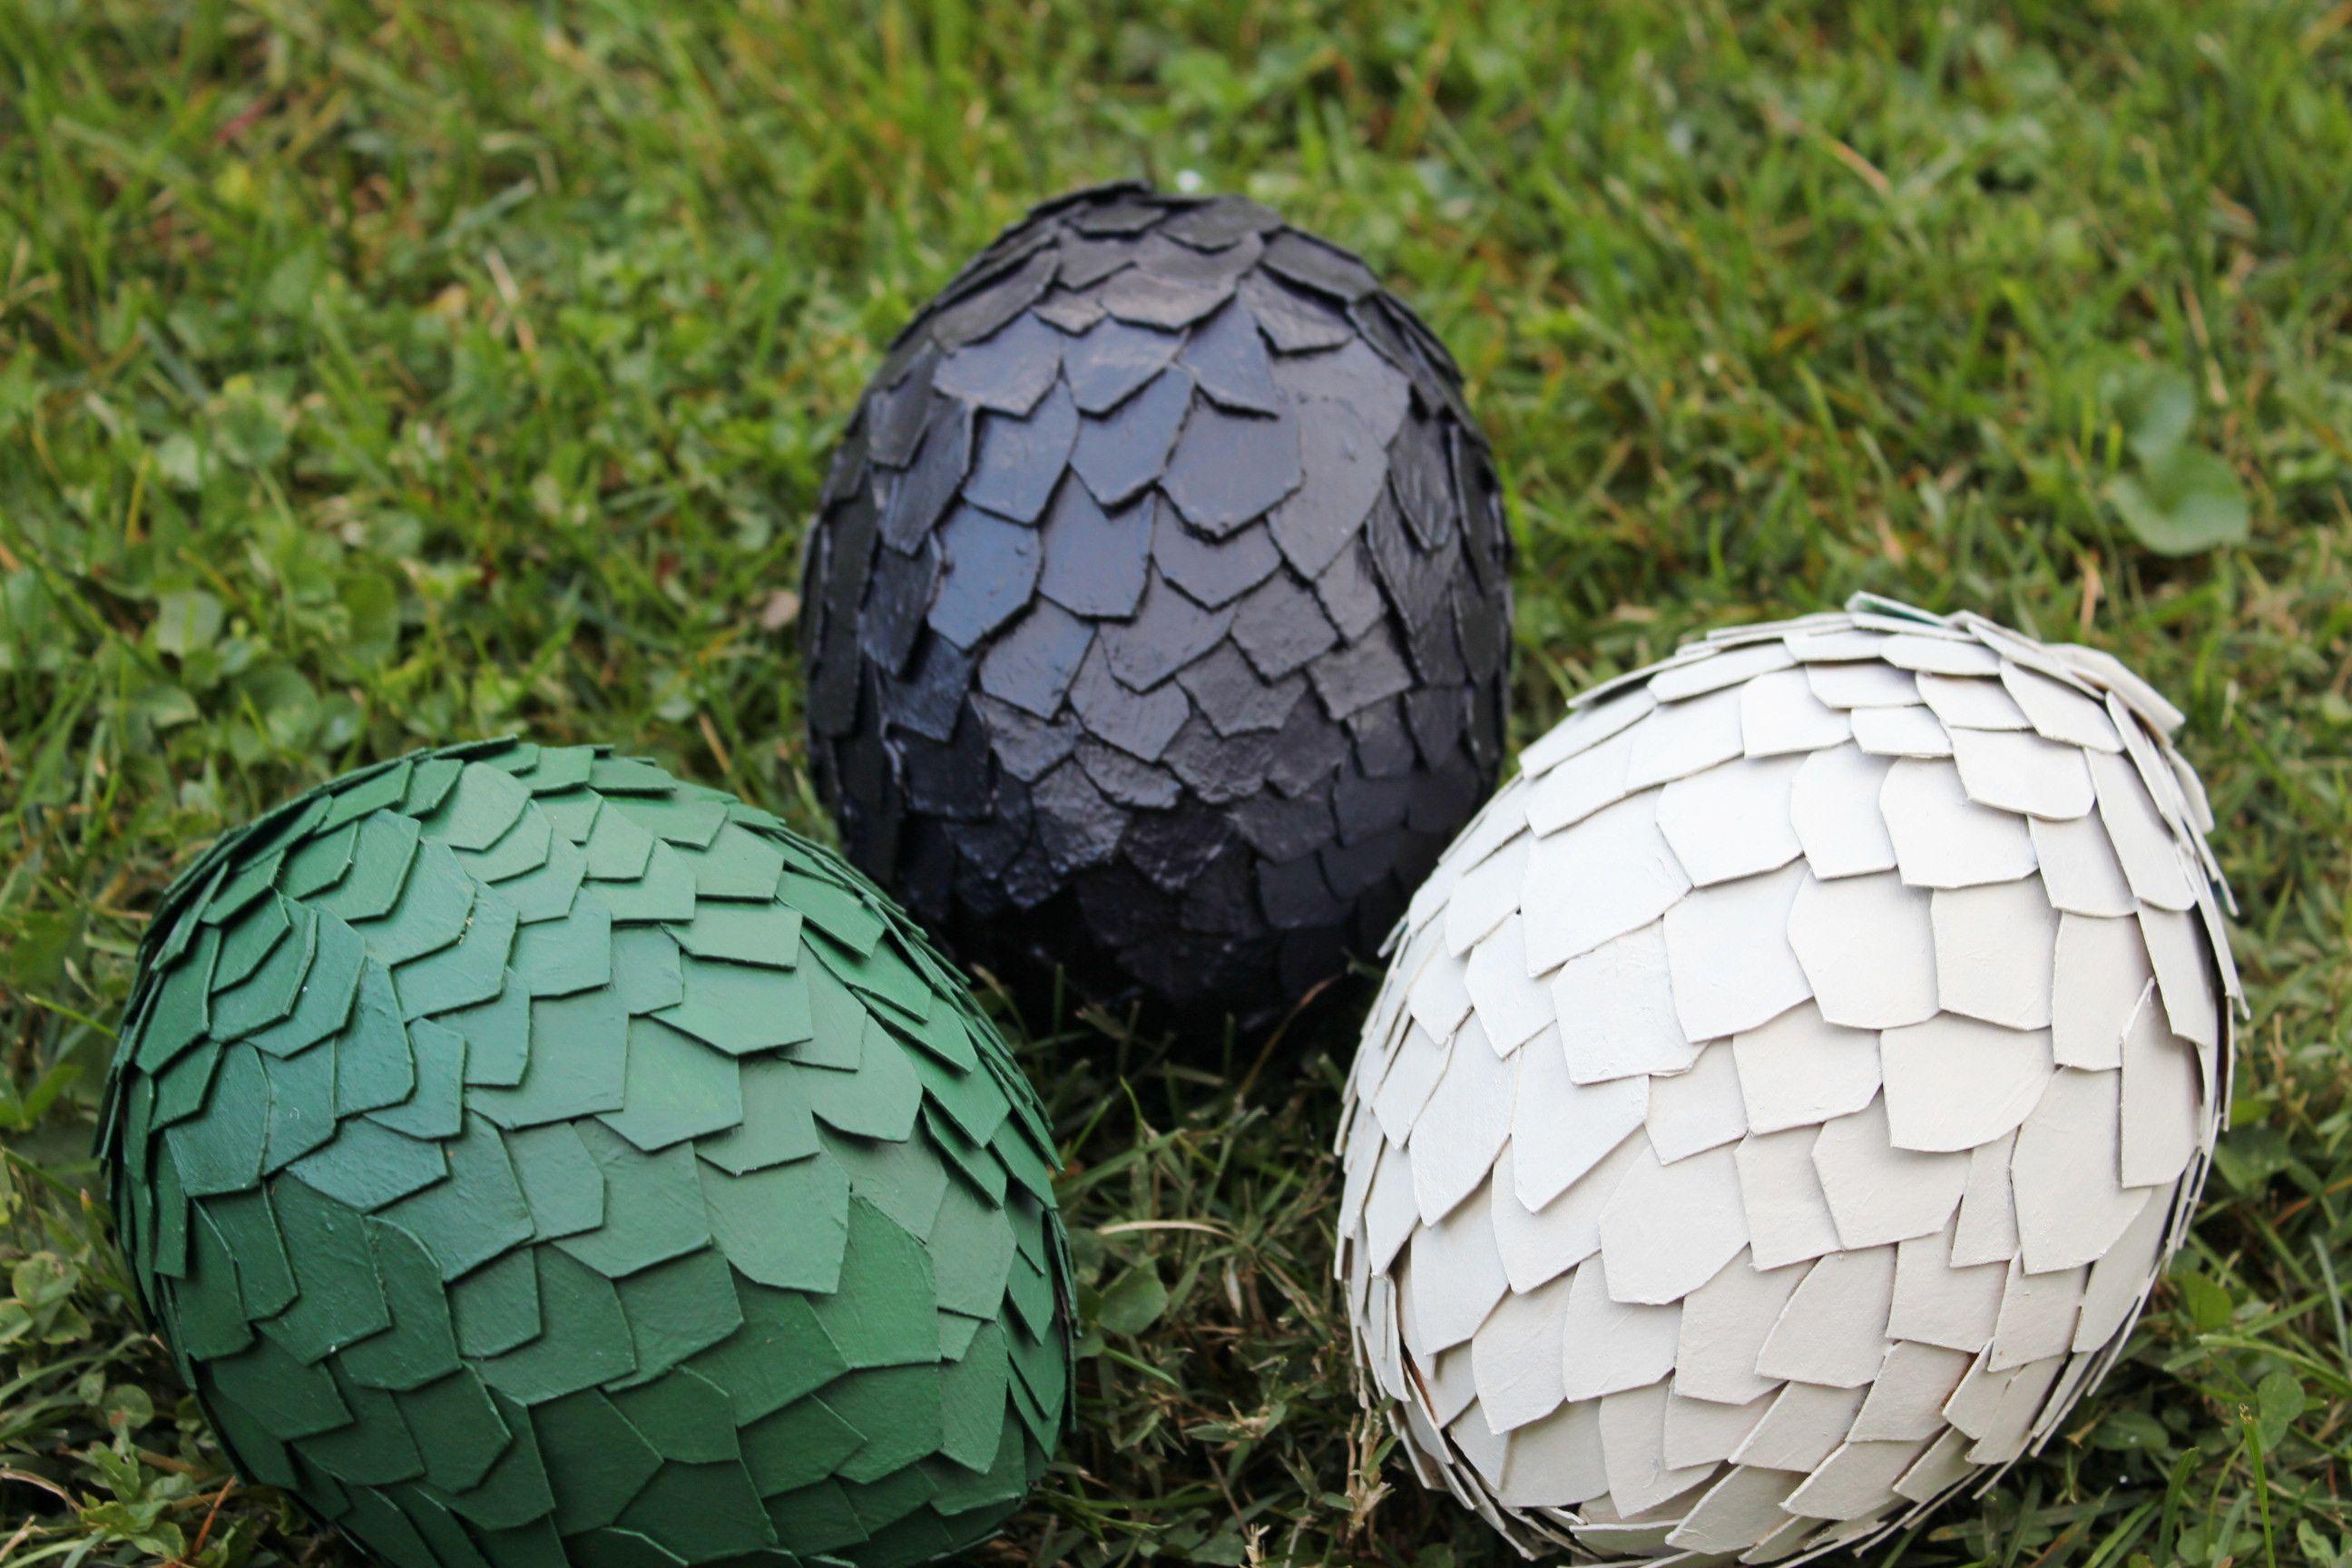 My coconut and cardboard dragon eggs